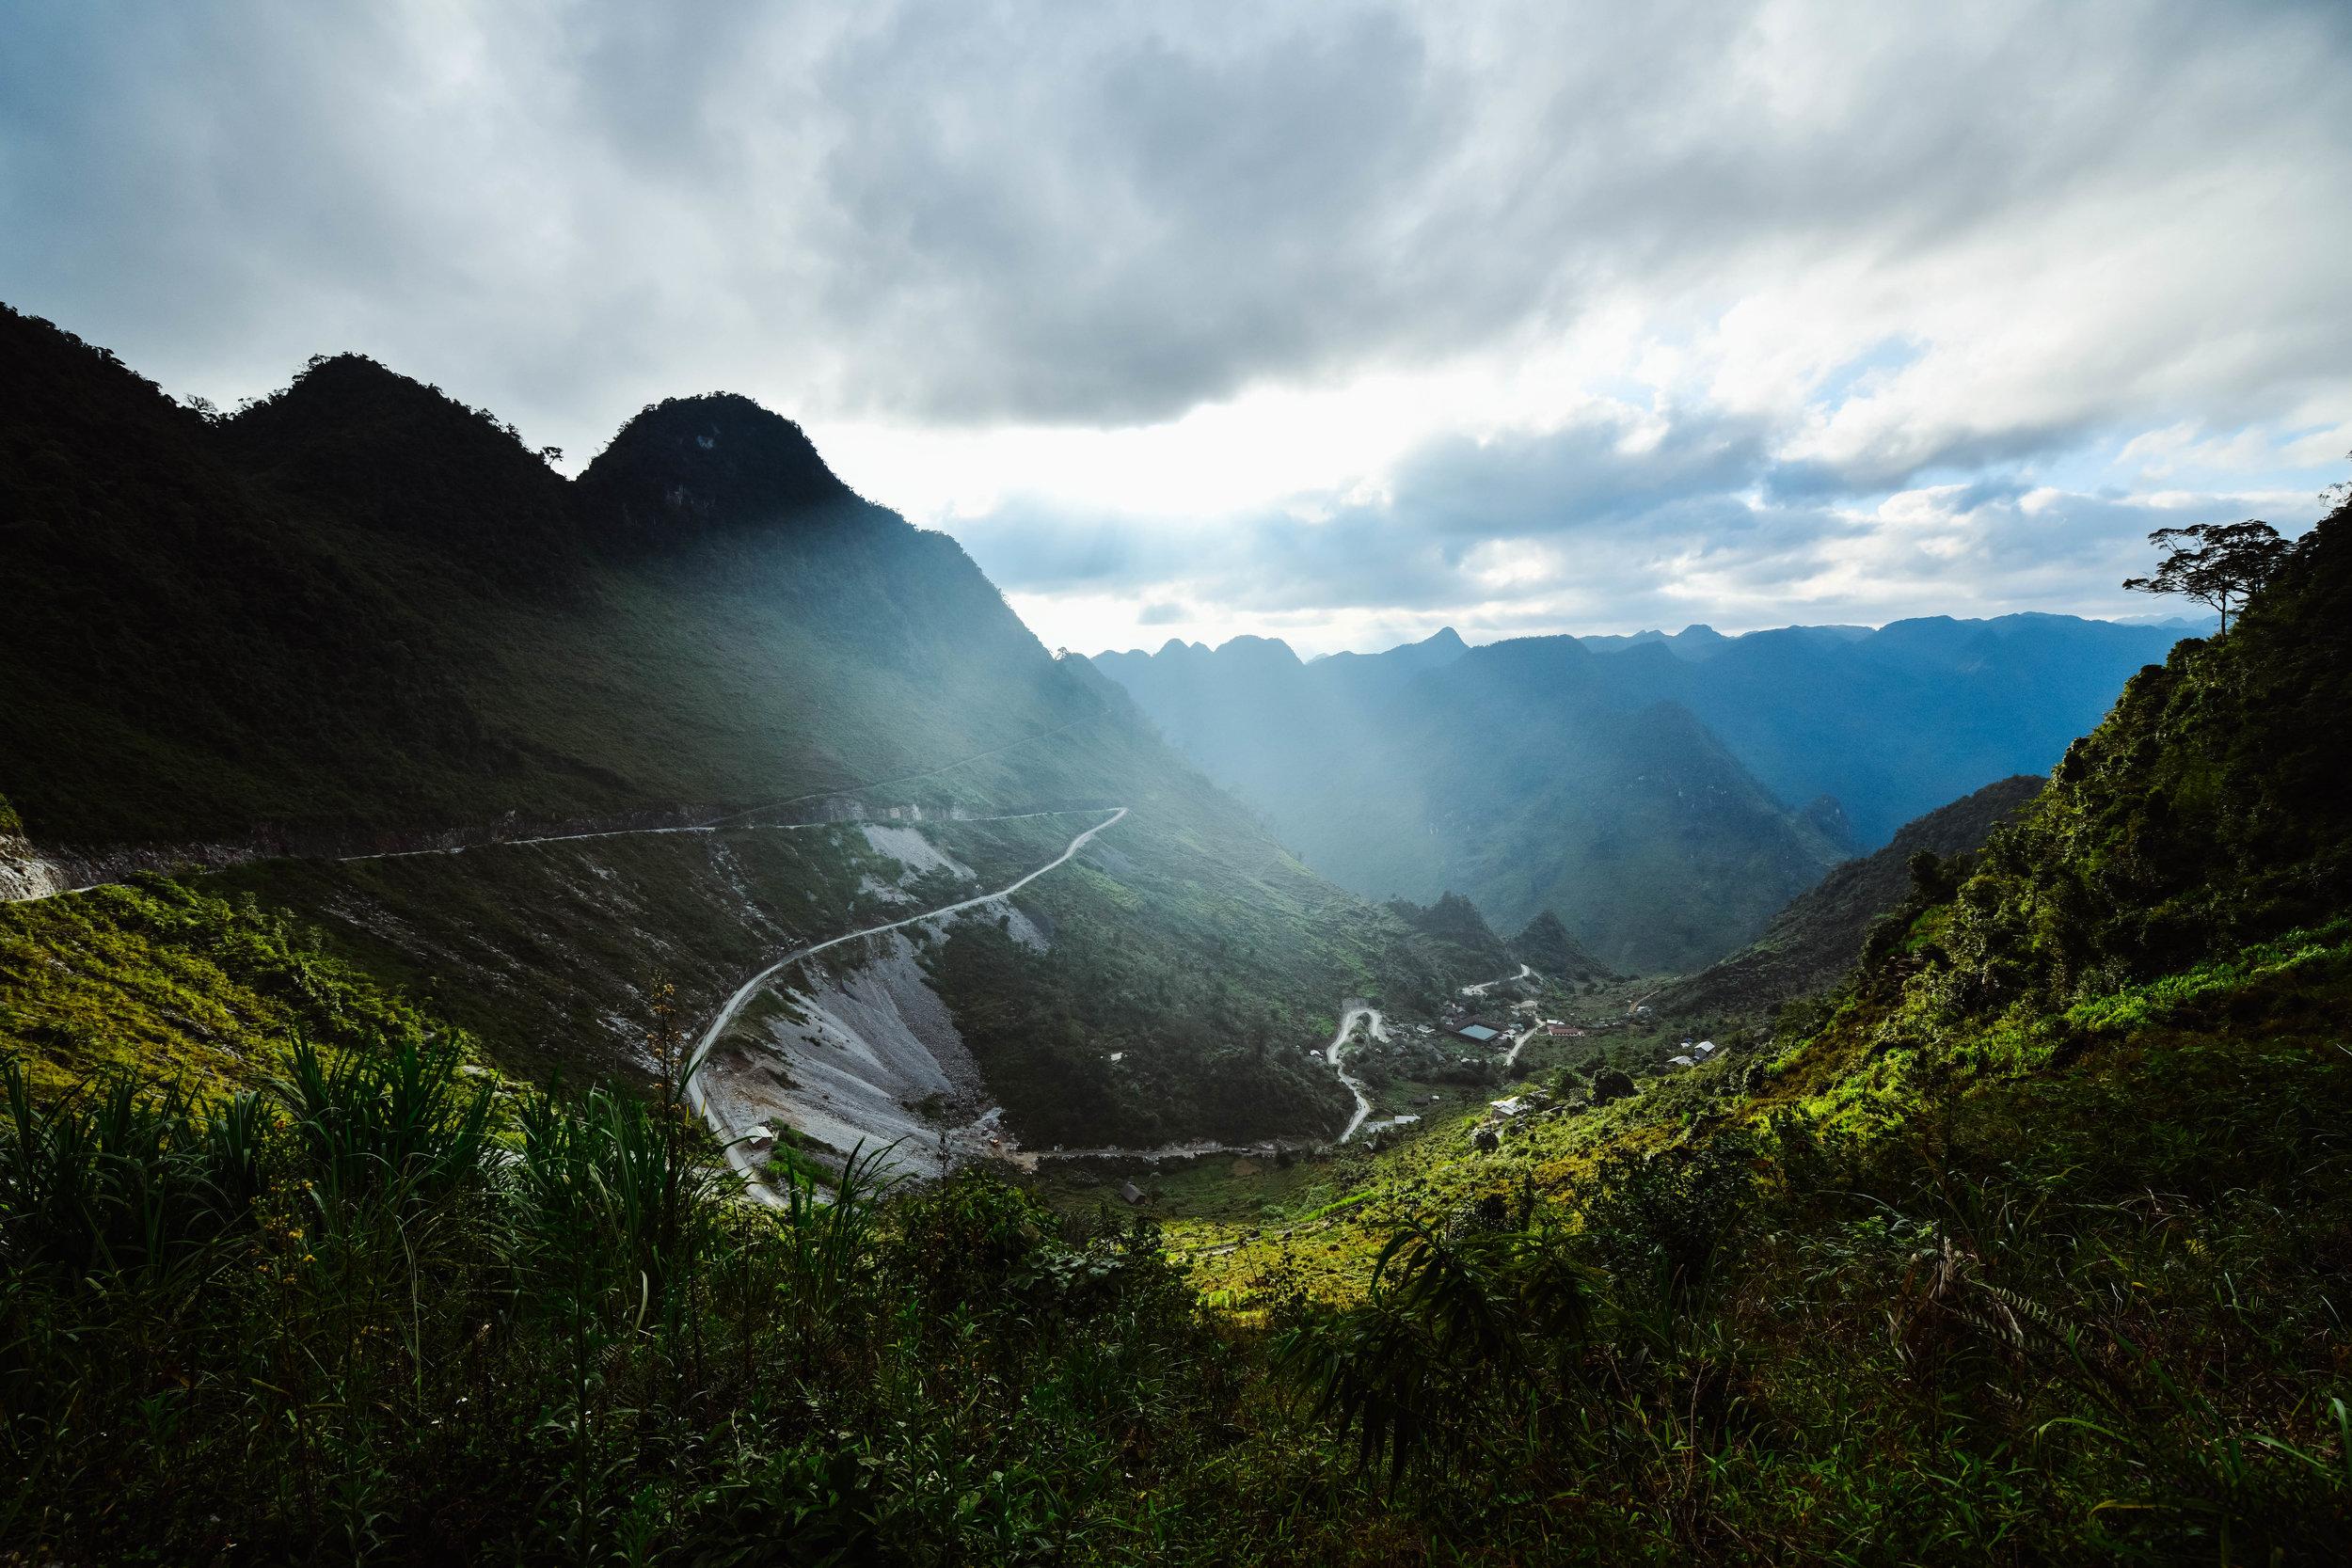 ha-giang-landscape